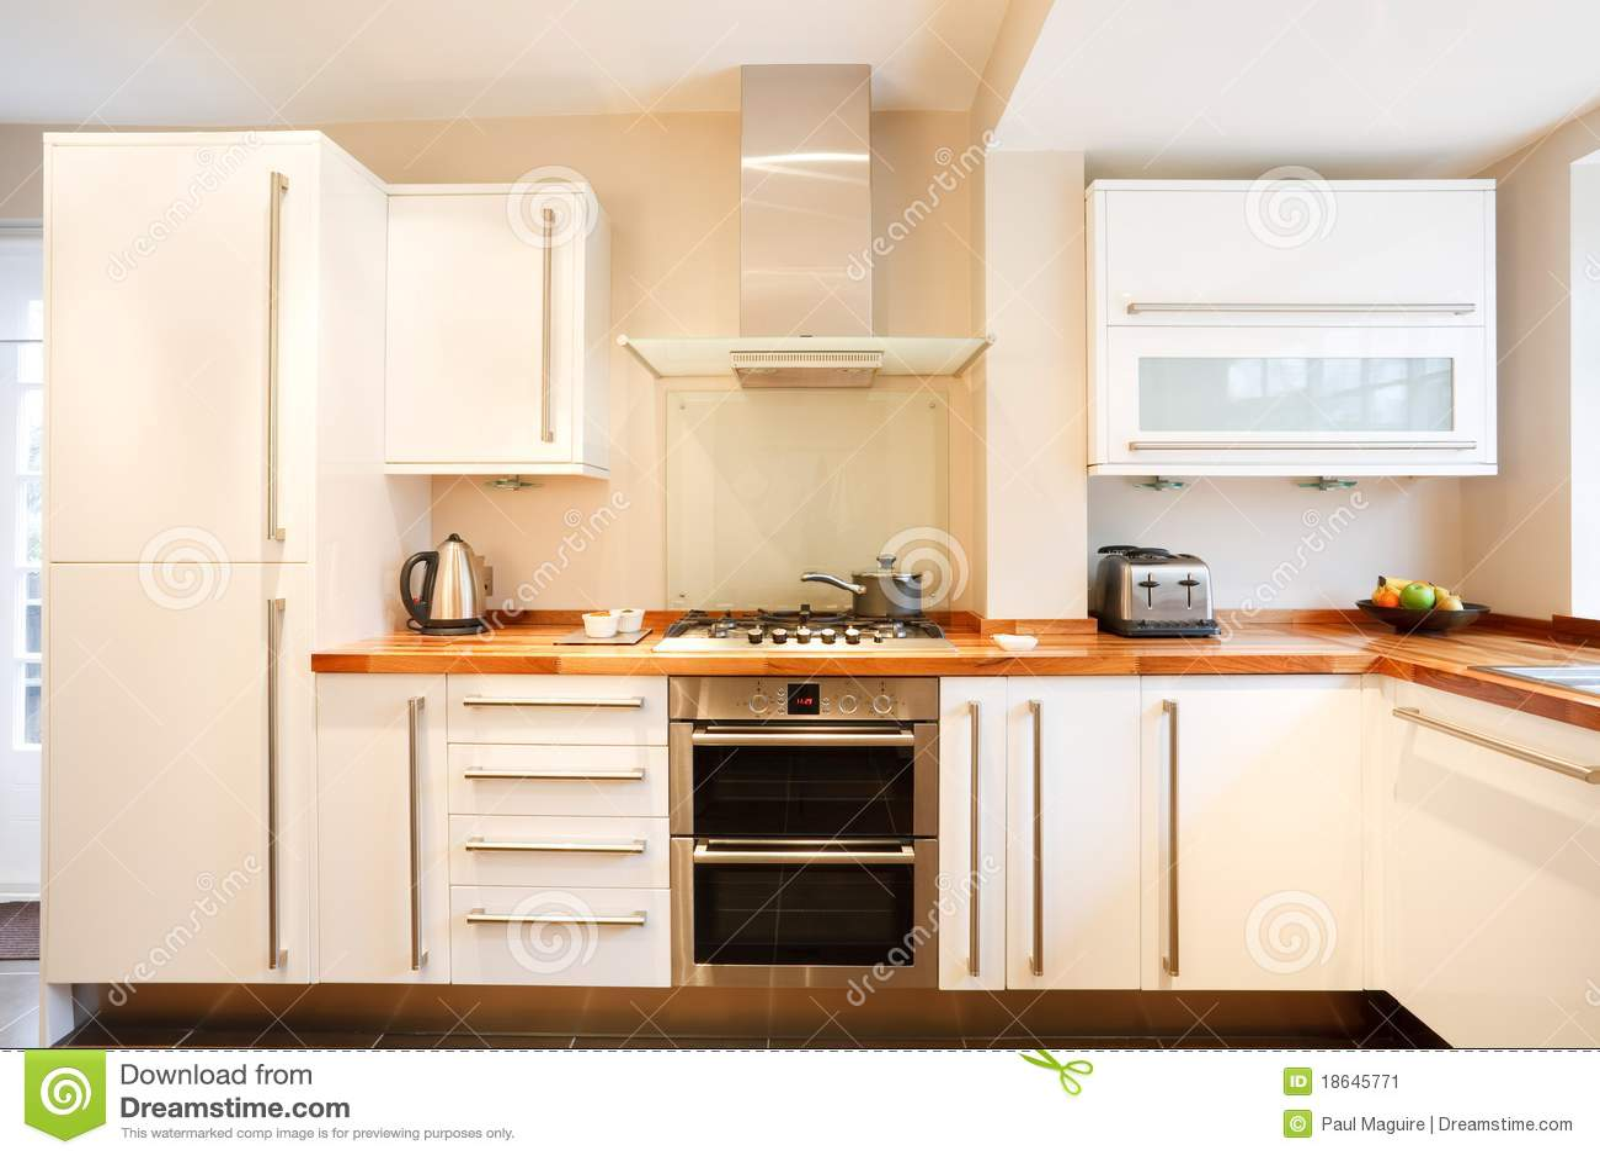 Moderne keuken stock afbeelding afbeelding bestaande uit huishouden 18645771 - Afbeelding moderne keuken ...